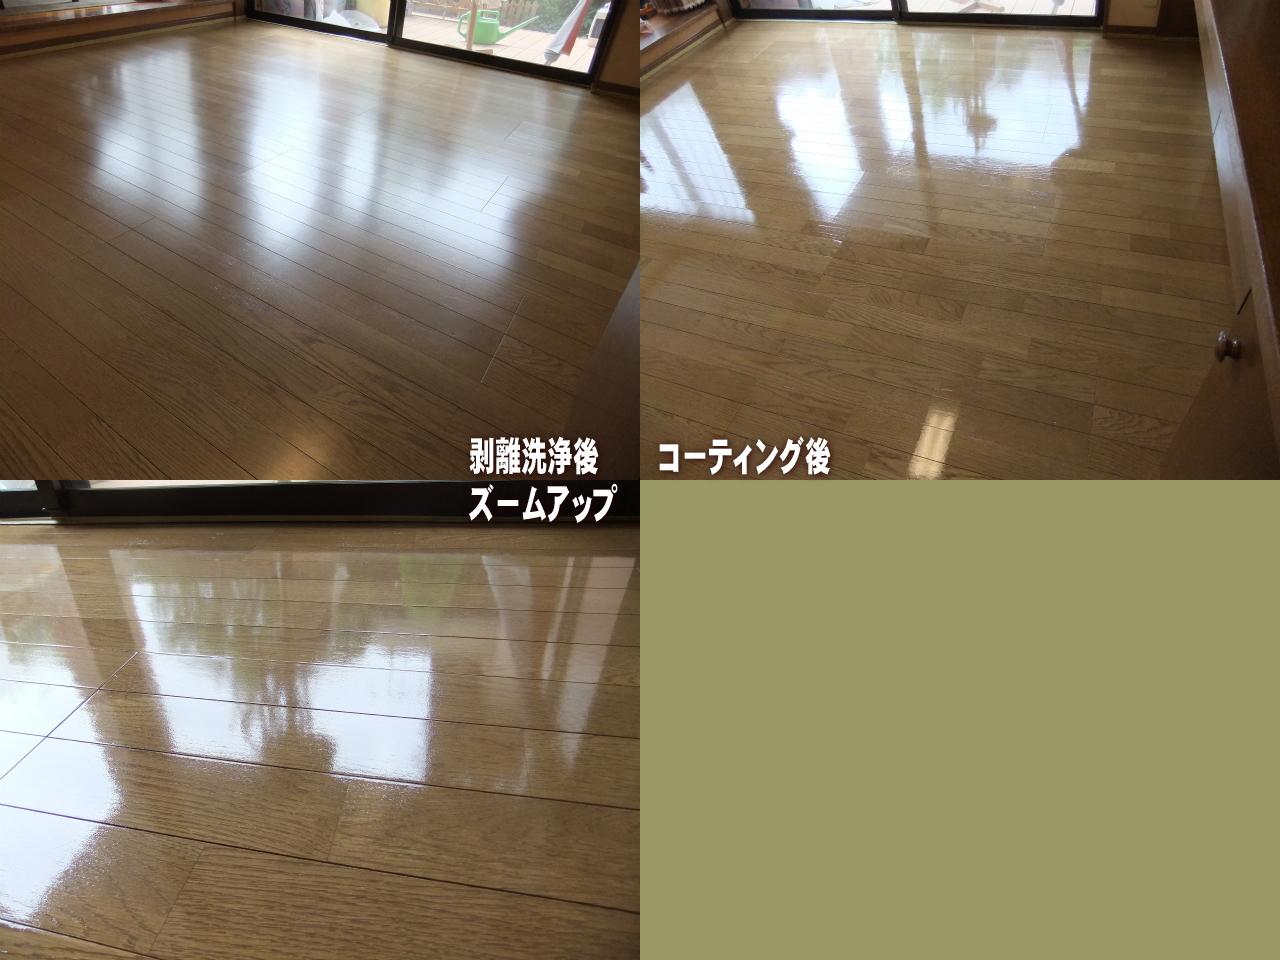 http://ajras.net/images/110831-coating3.jpg